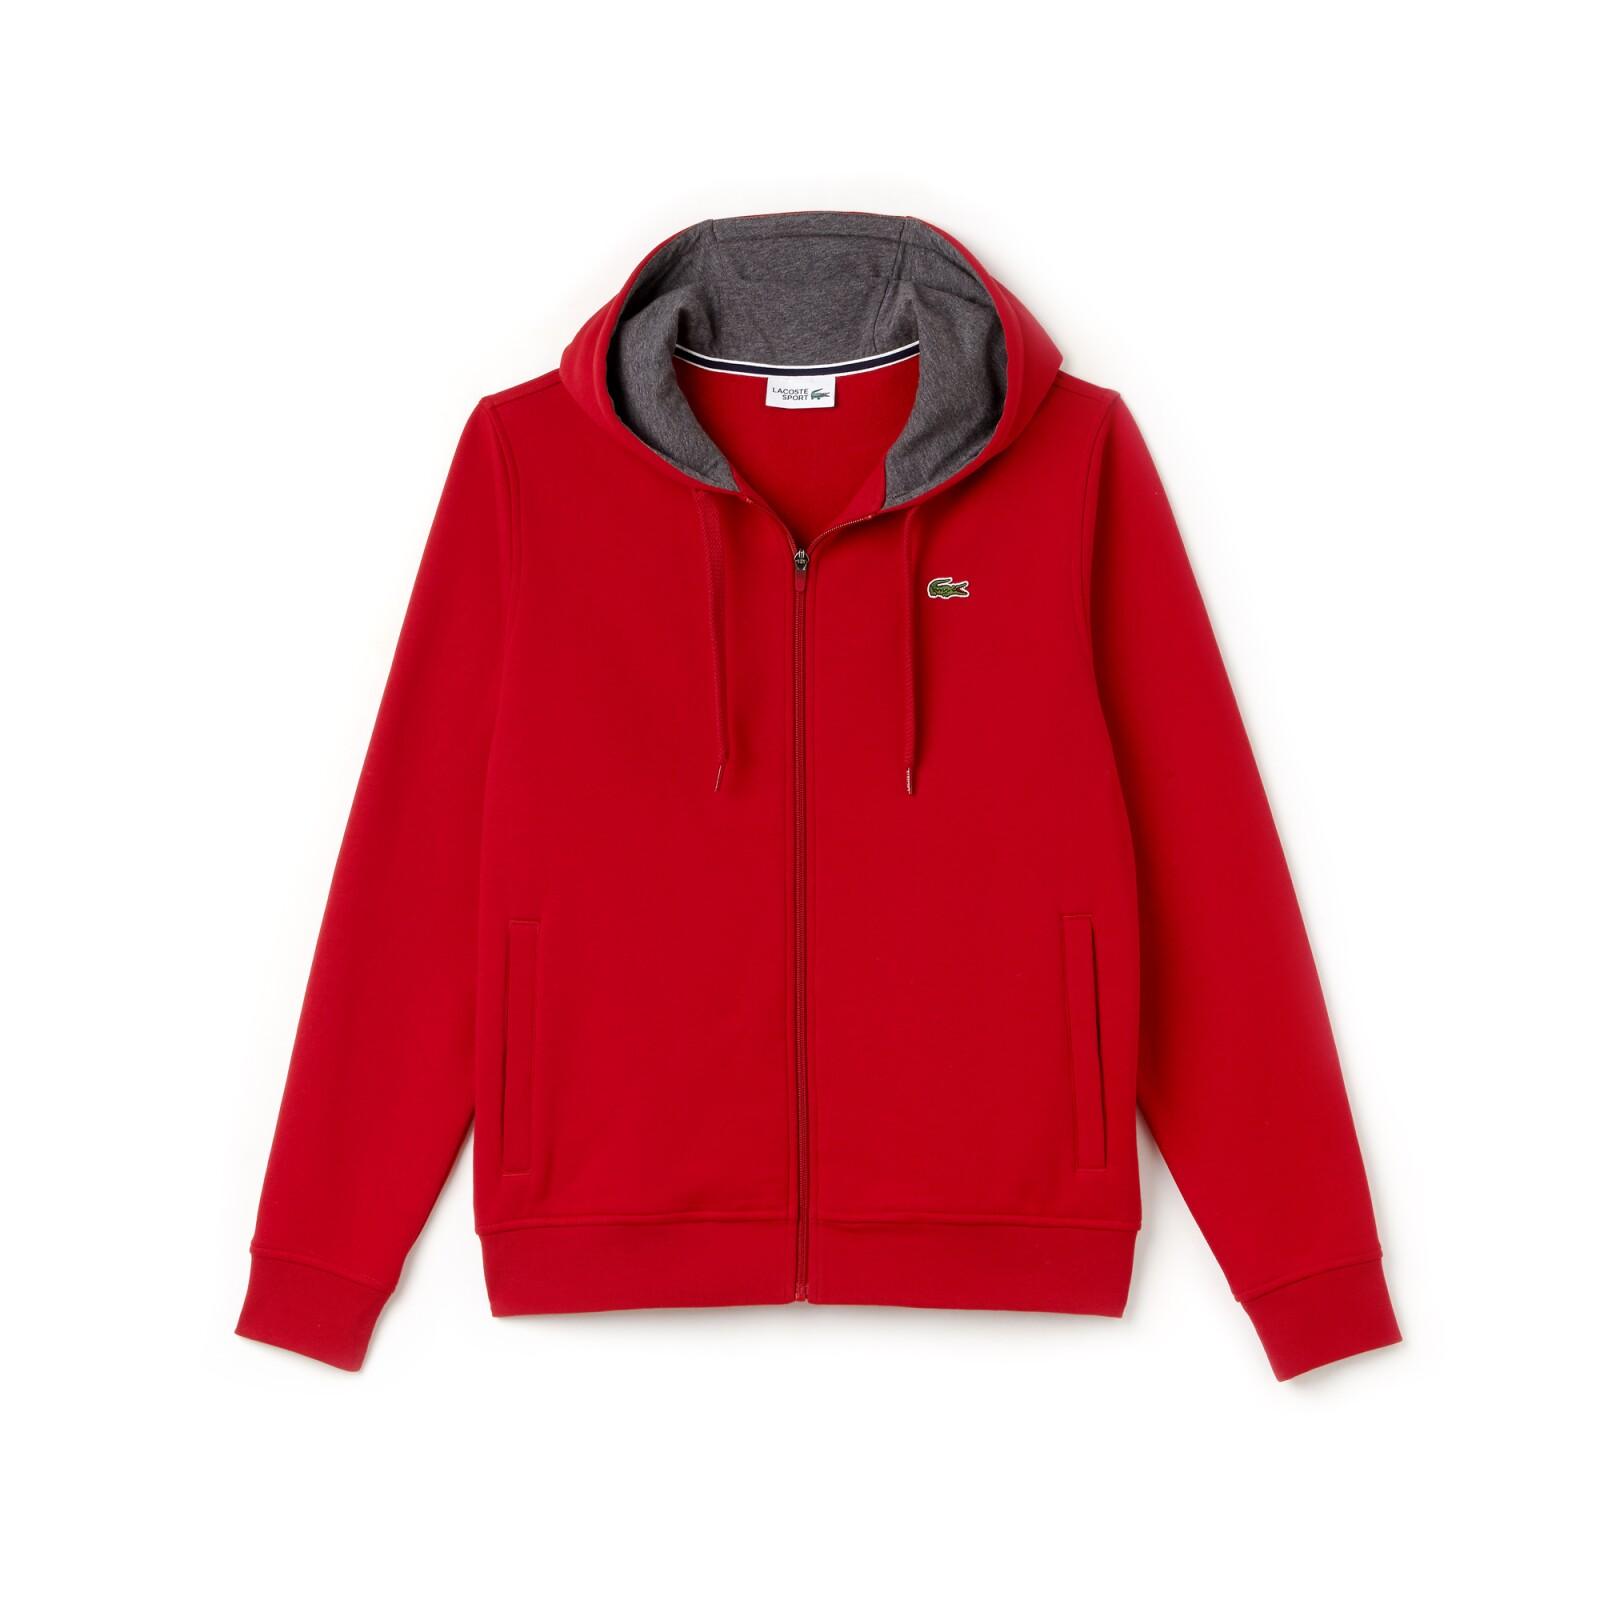 Sweatshirt en rojo